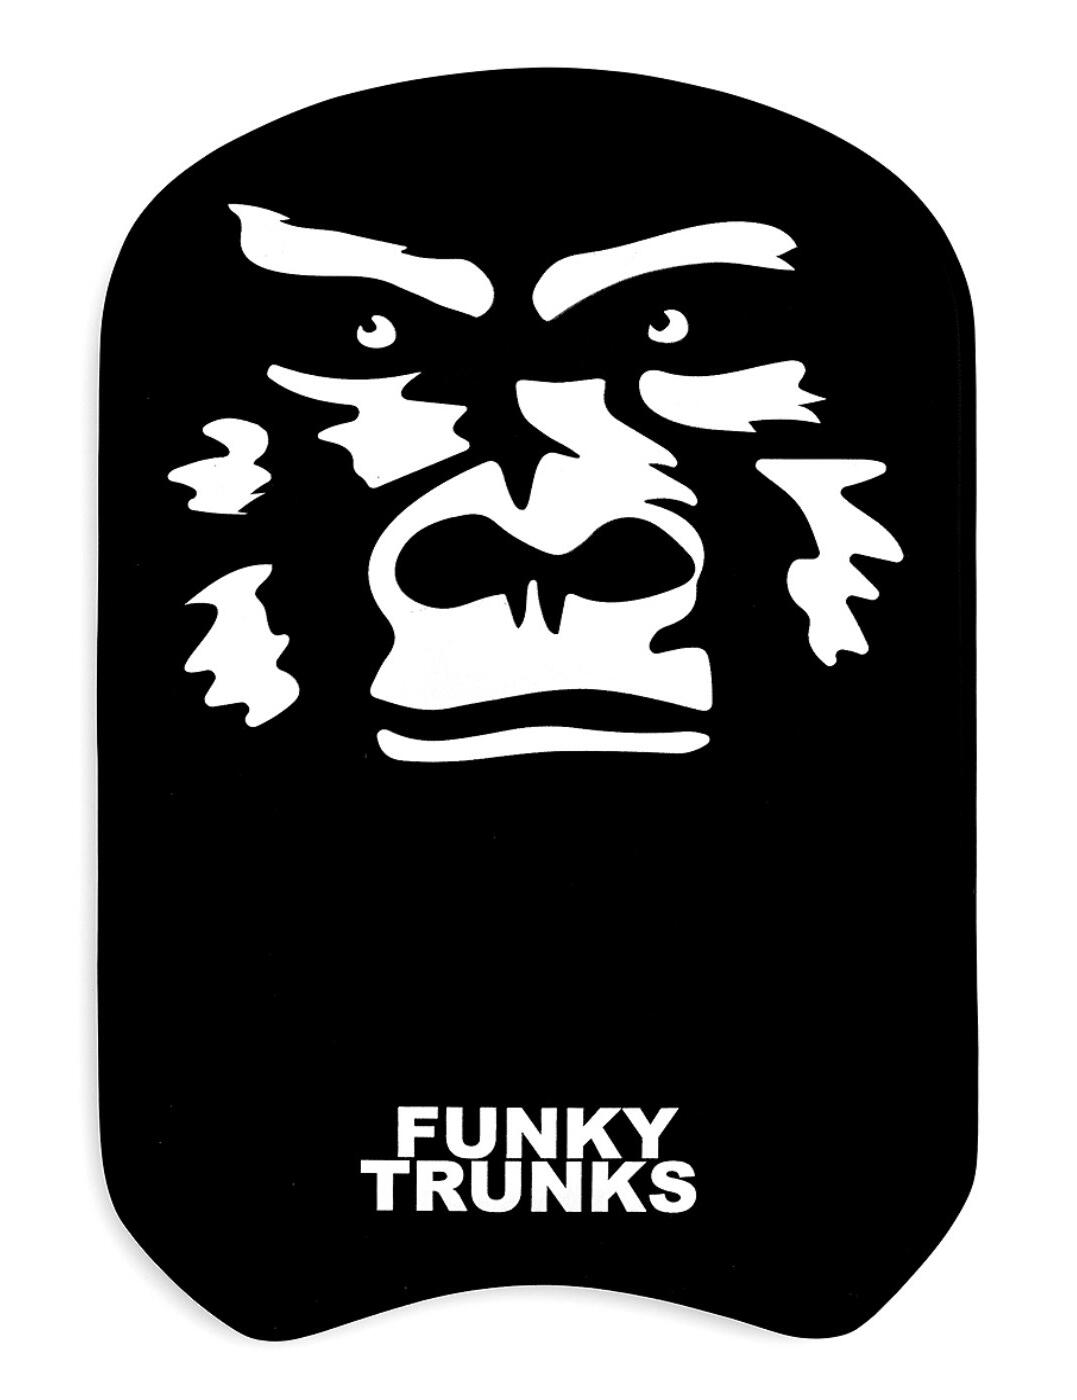 FTG002N01047 Funky Trunks The Beast Kickboard Float - FTG002N01047 The Beast (Black)